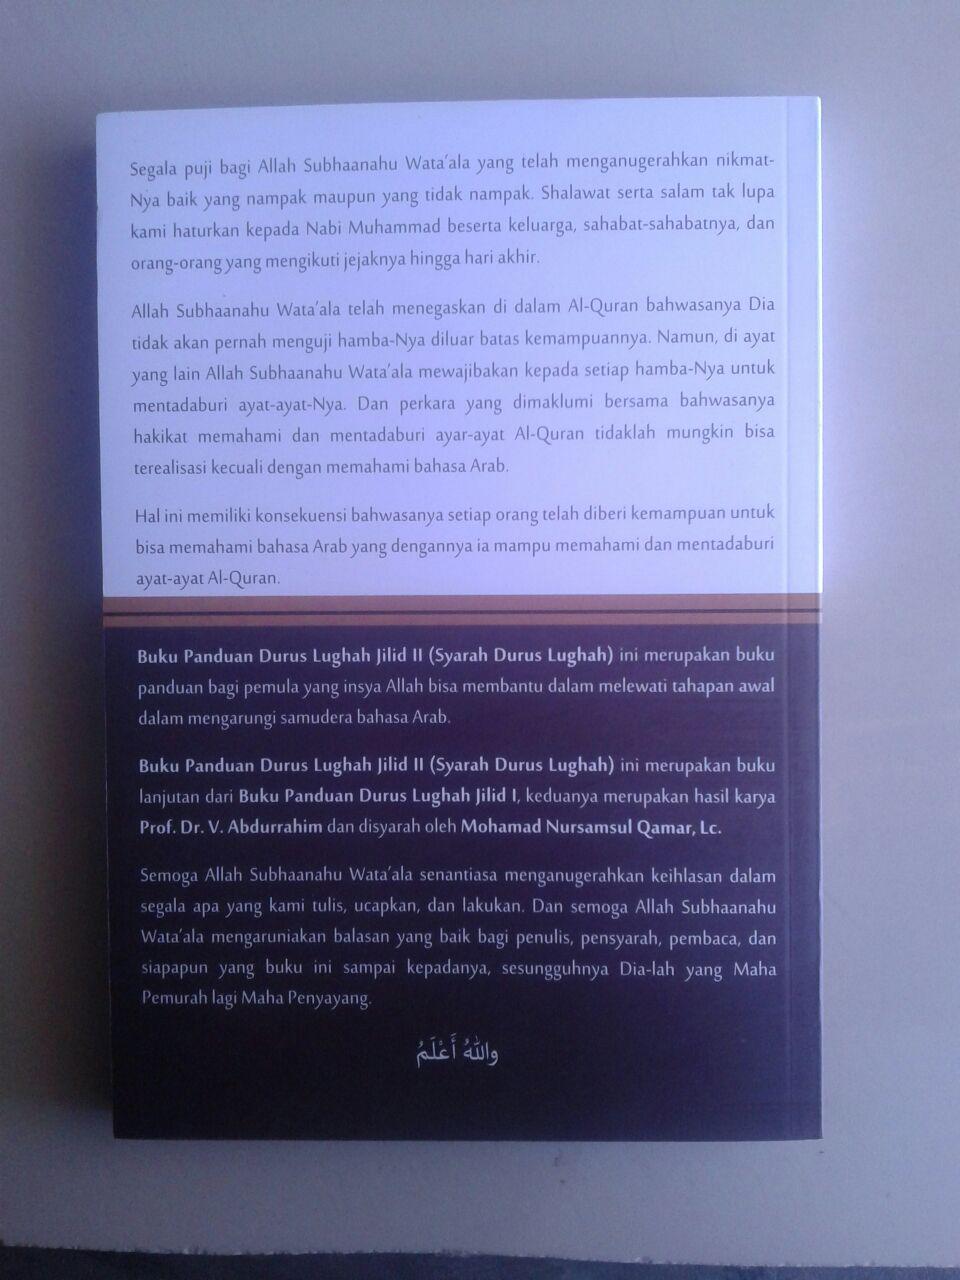 Buku Panduan Durus Lughah 2 Syarah Durusul Lughah cover